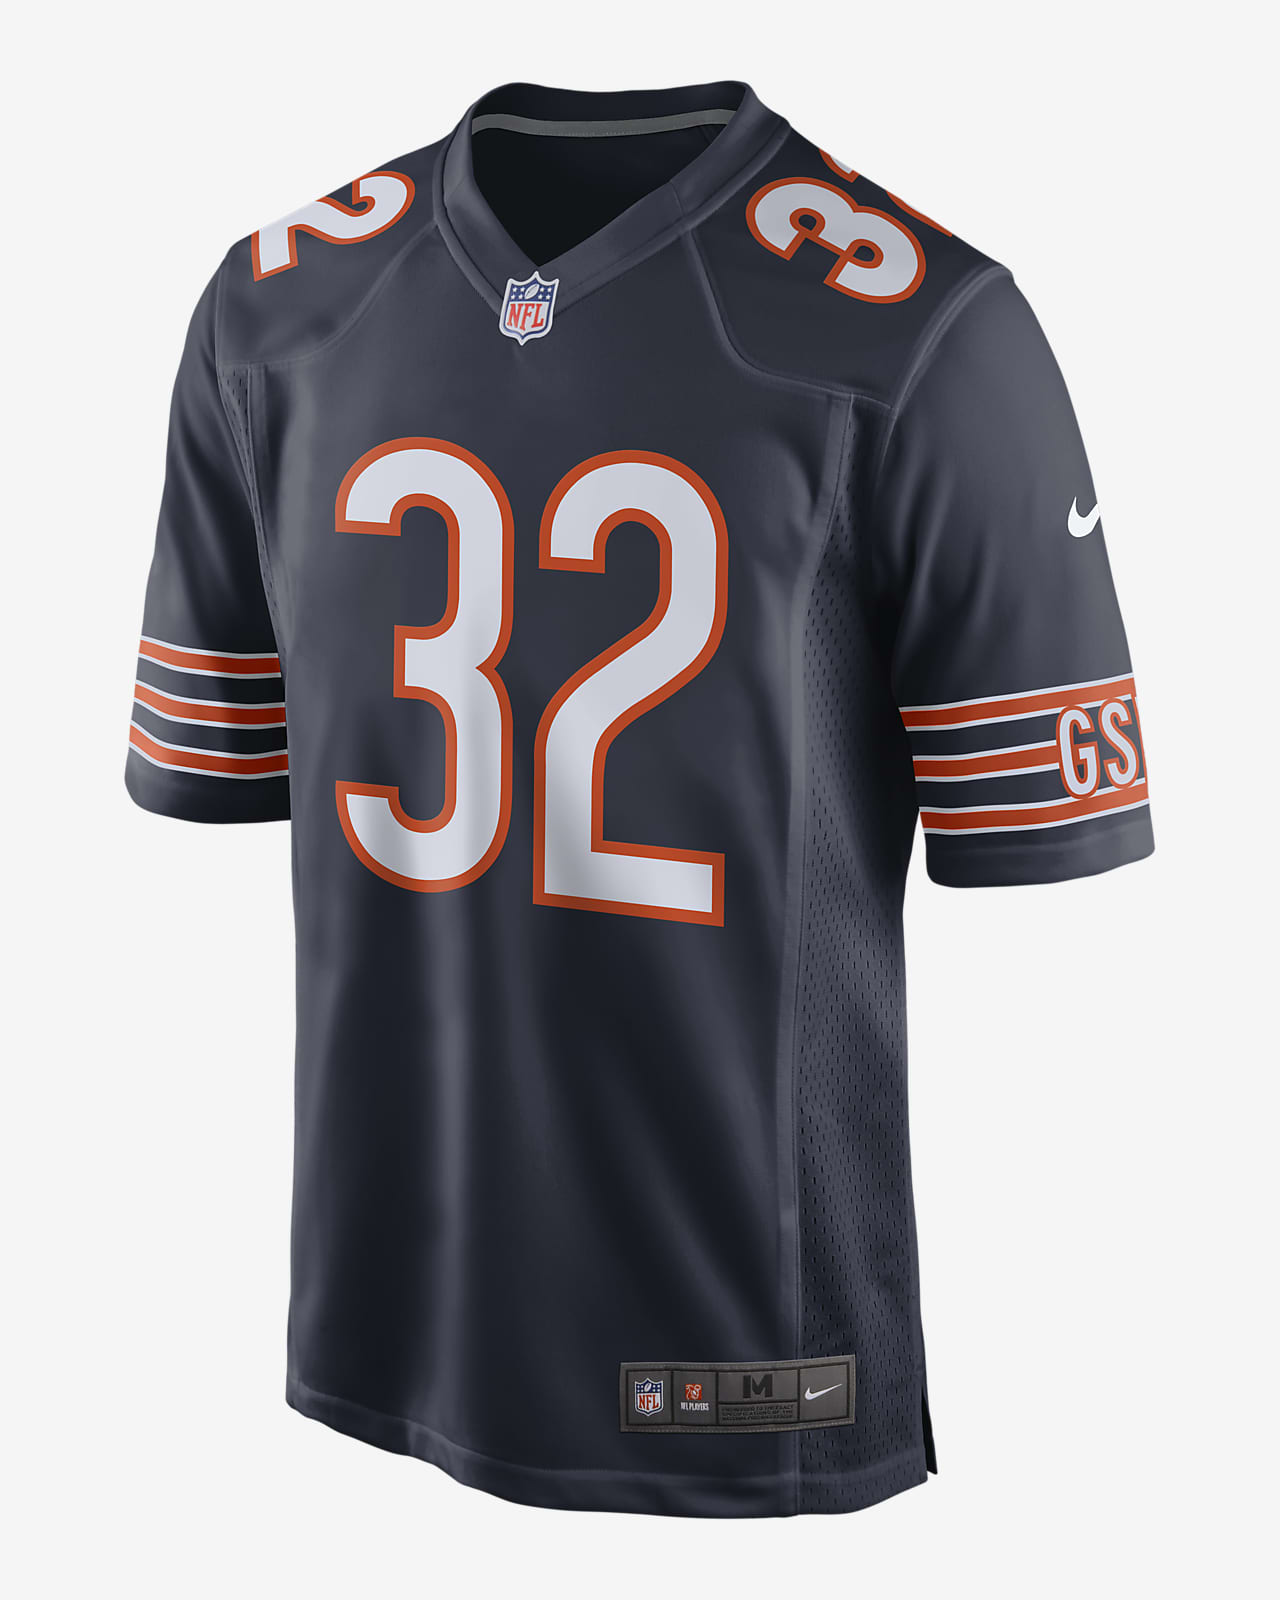 NFL Chicago Bears (David Montgomery) Men's Game Football Jersey